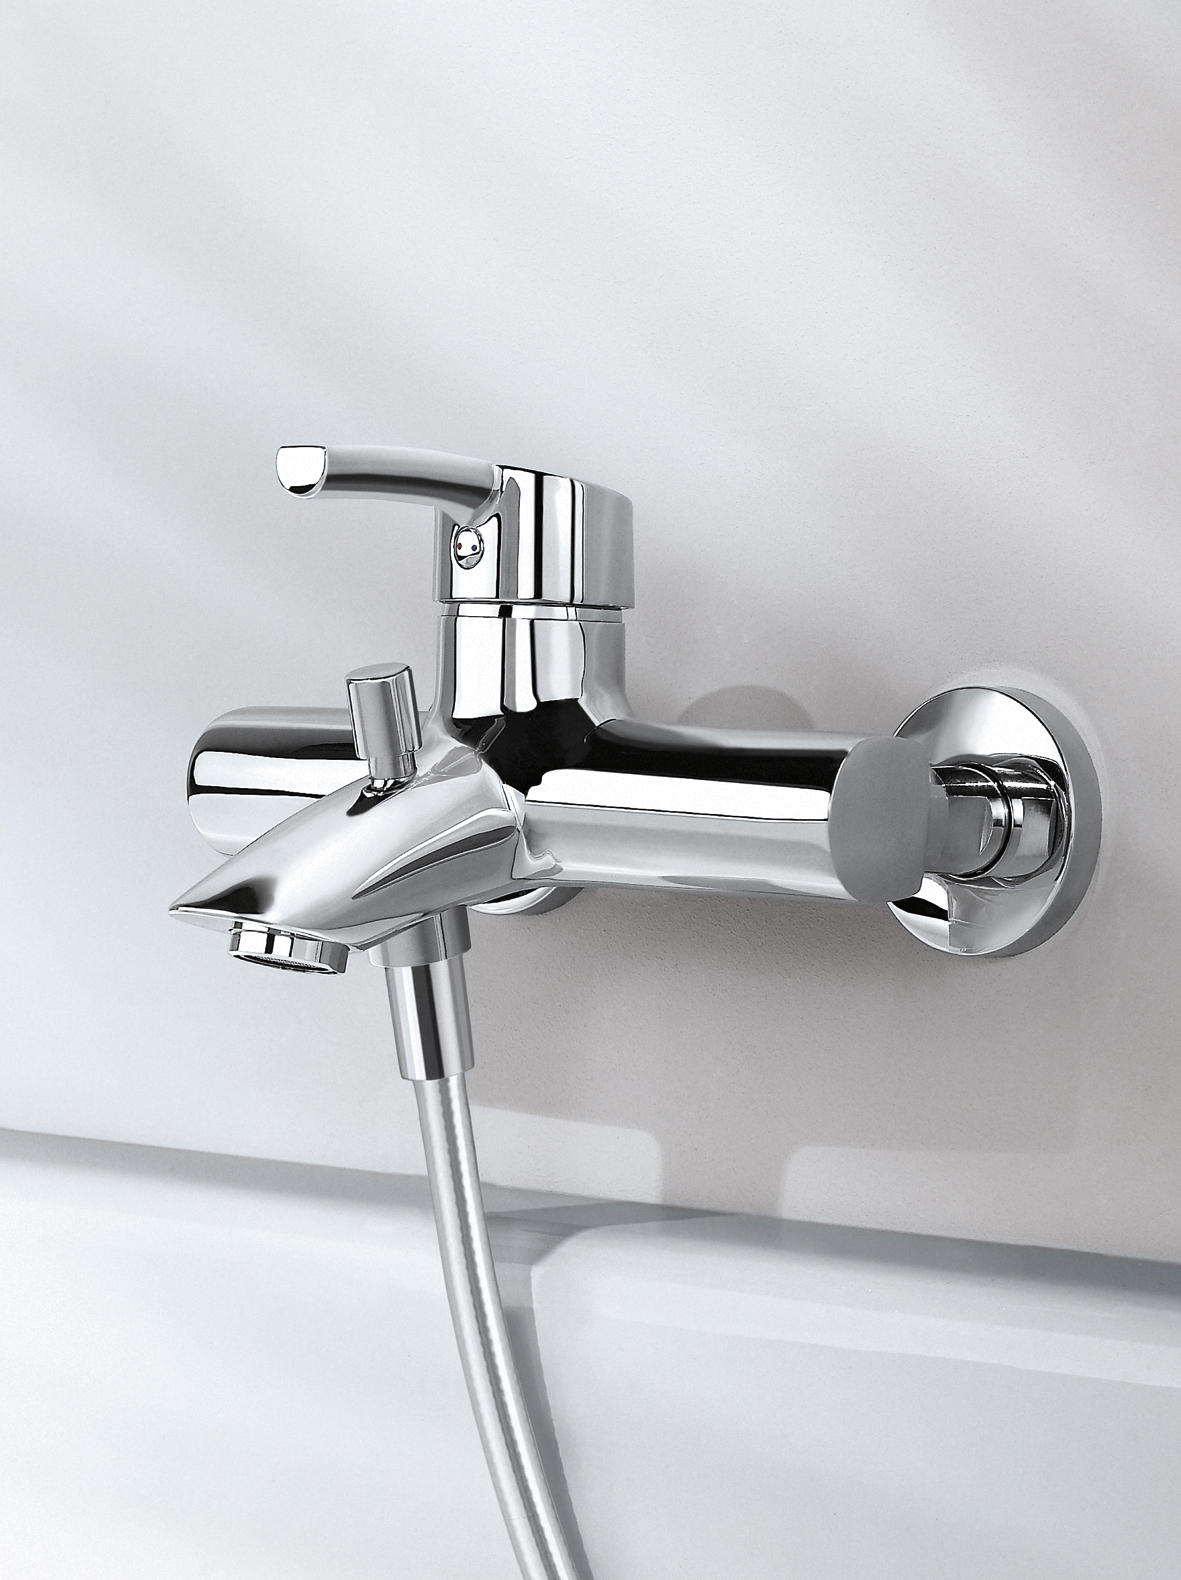 arwa surf mitigeur de lavabo robinetterie pour lavabo de arwa architonic. Black Bedroom Furniture Sets. Home Design Ideas